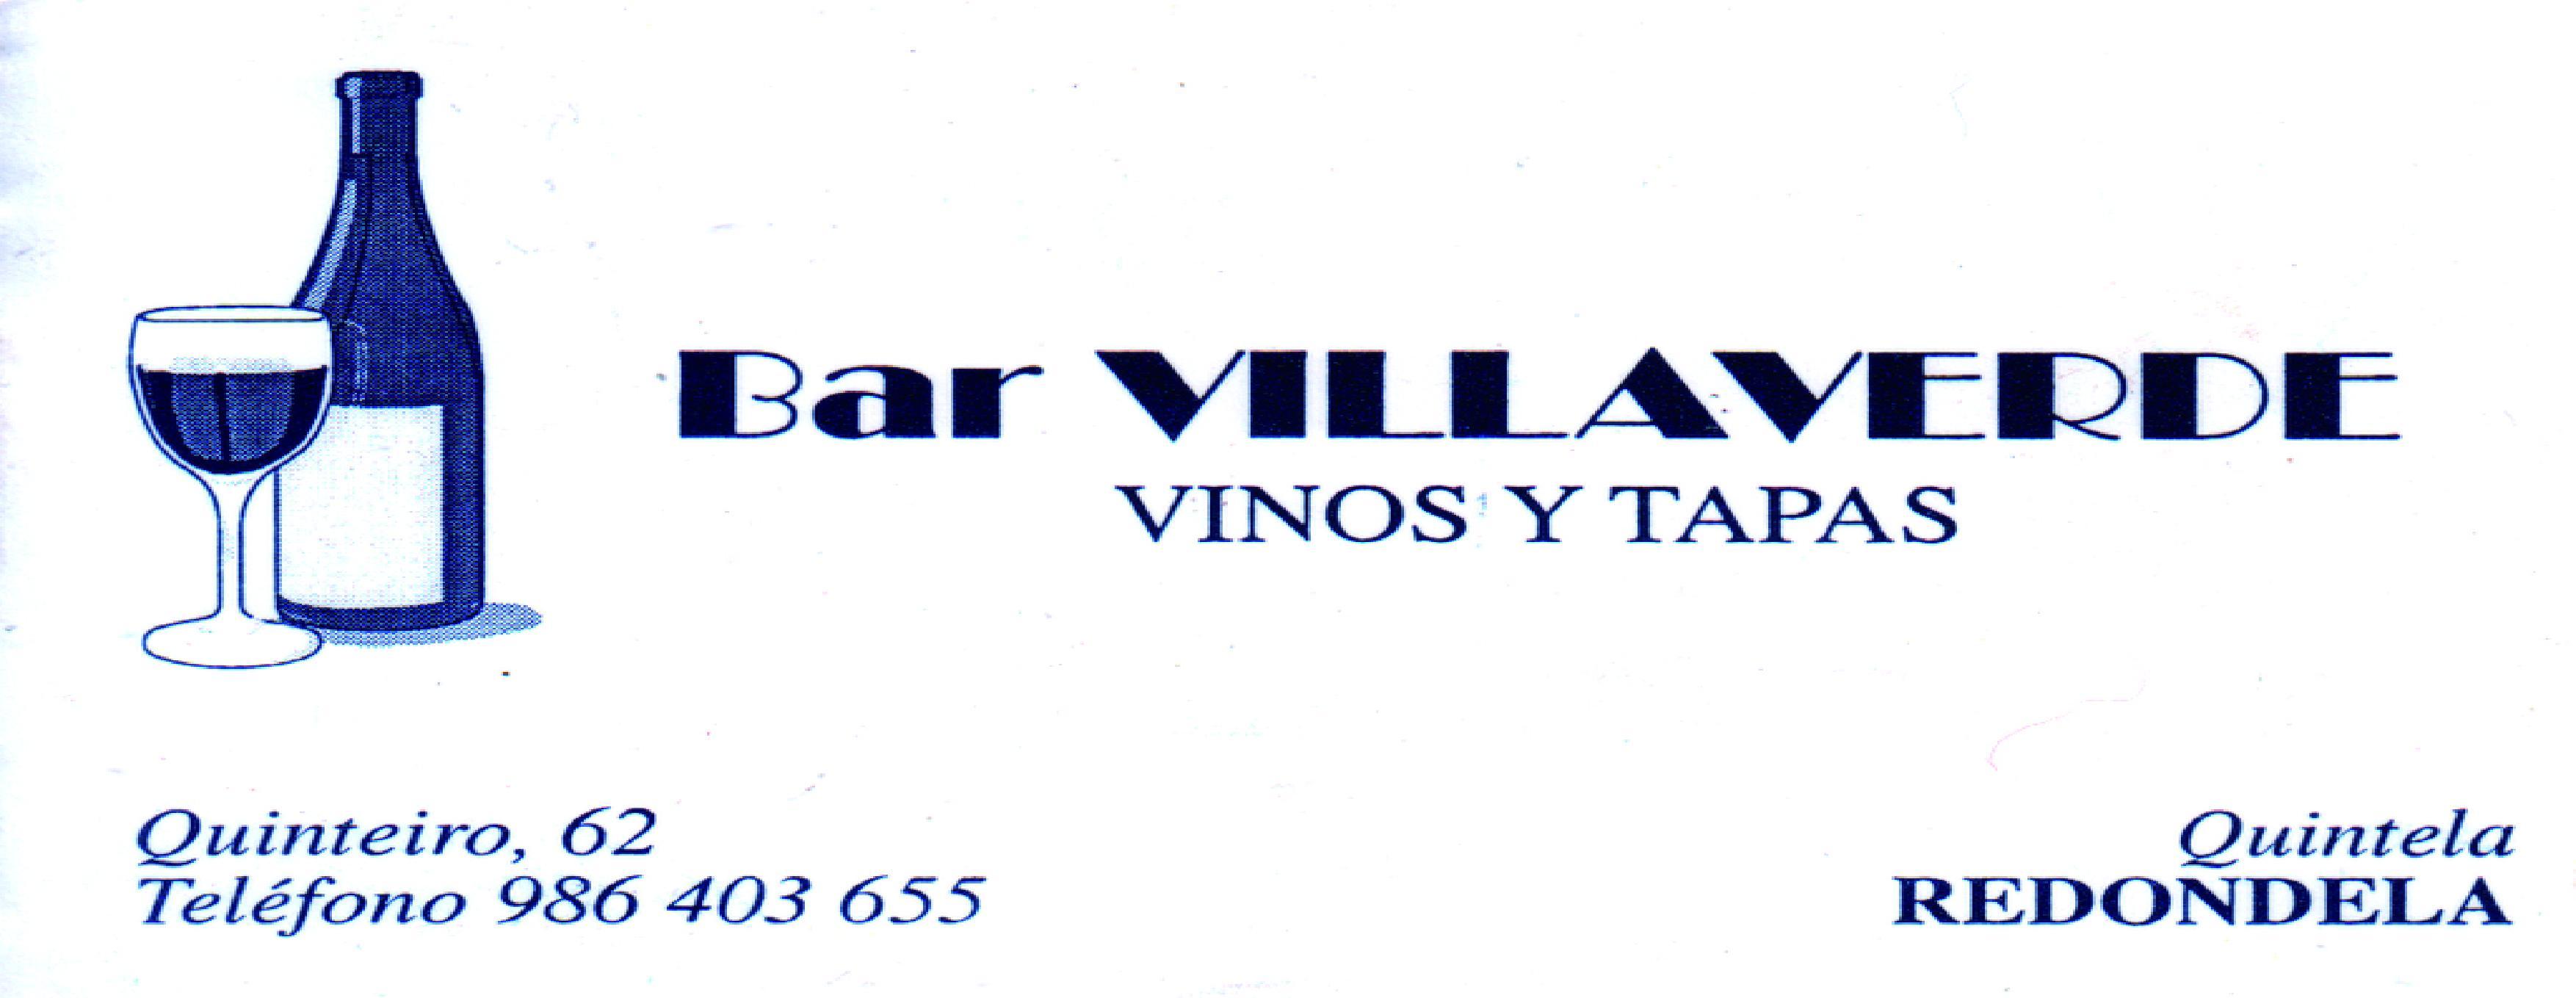 BAR VILLAVERDE